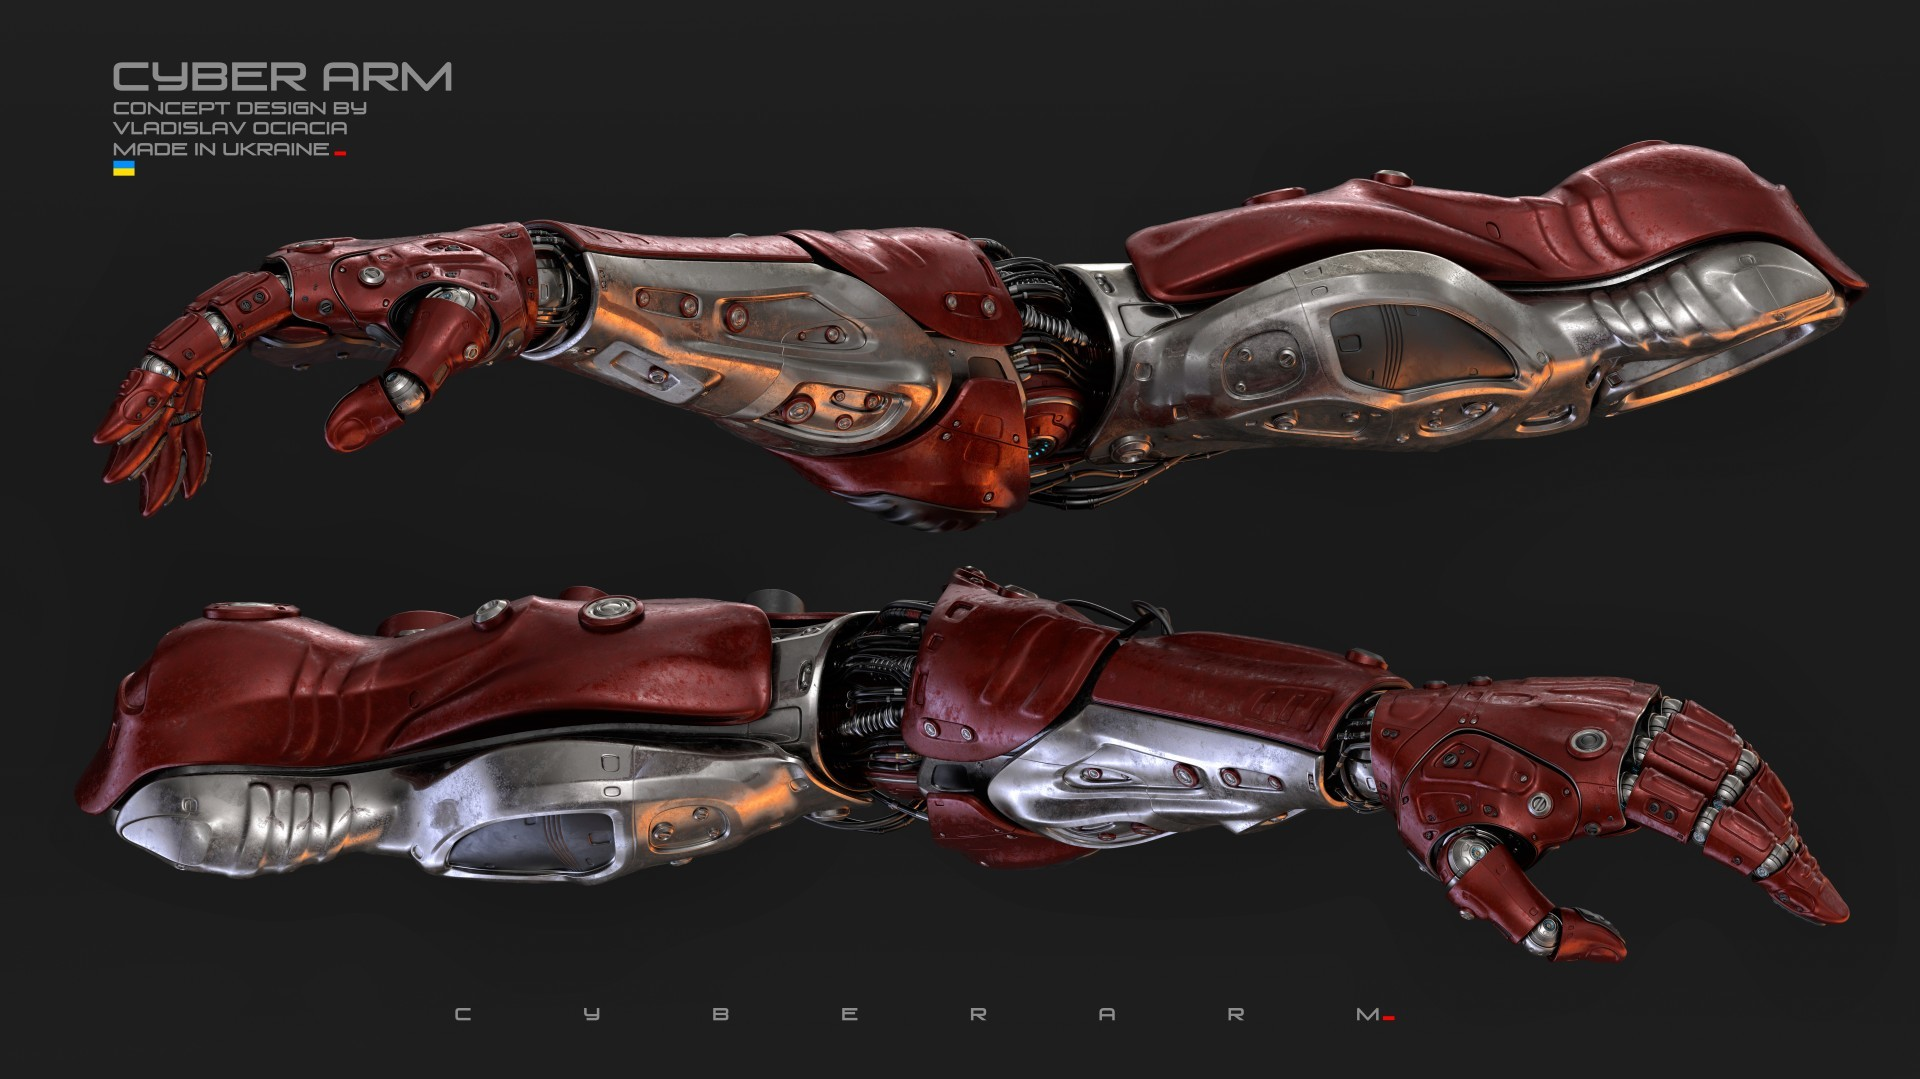 Vladislav ociacia cyber arm 7